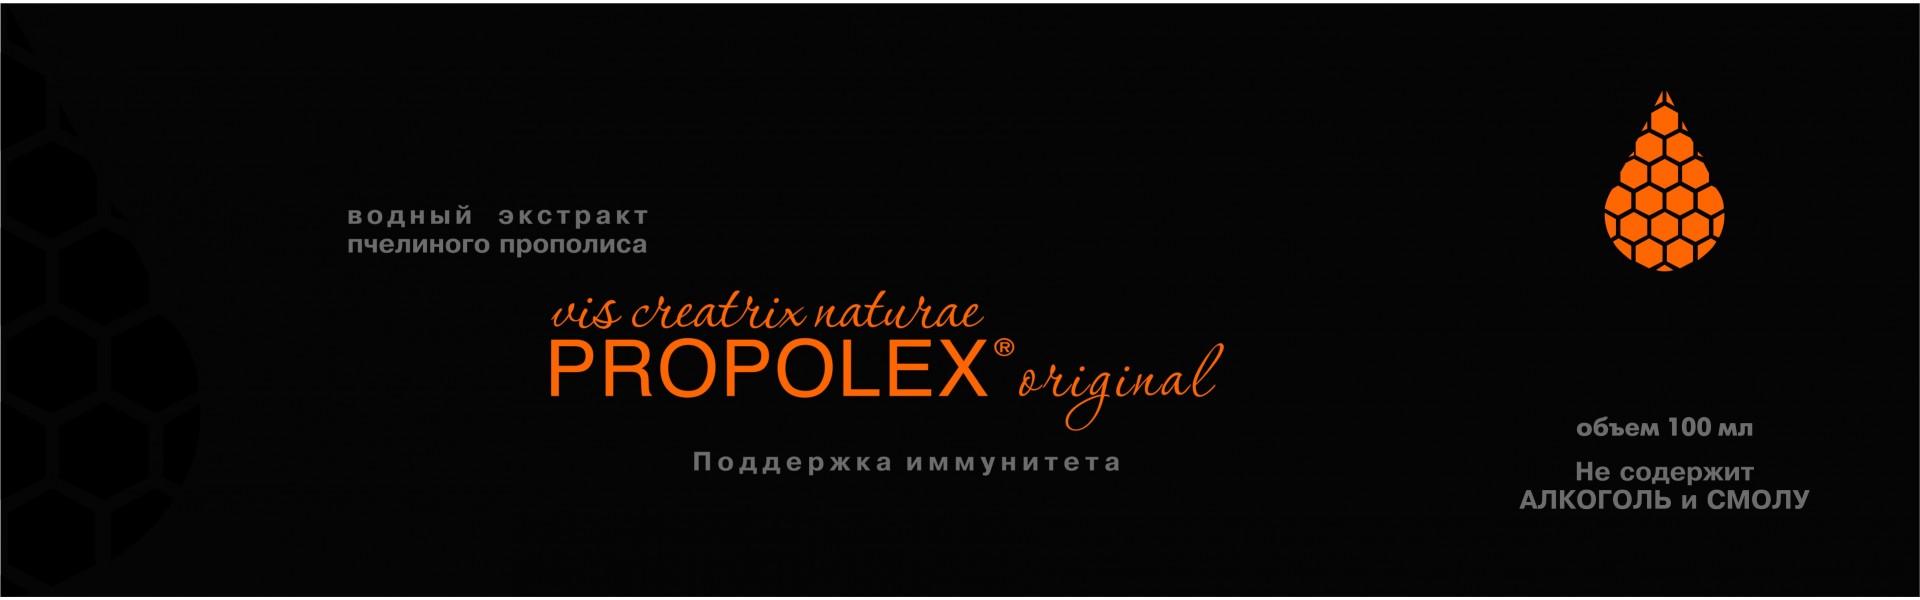 propolex original